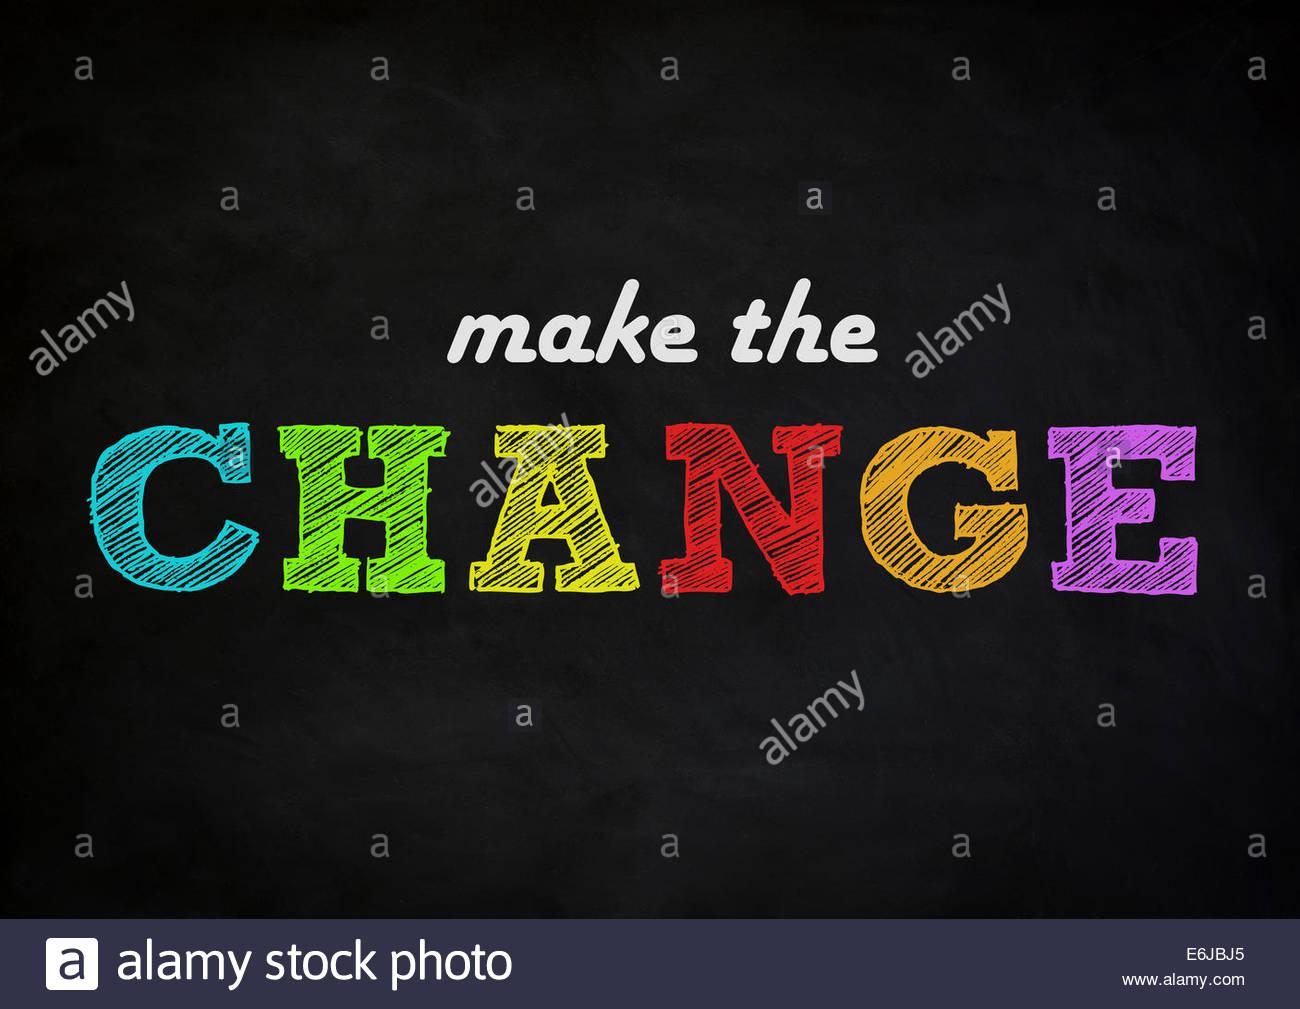 make the change - chalkboard concept - Stock Image